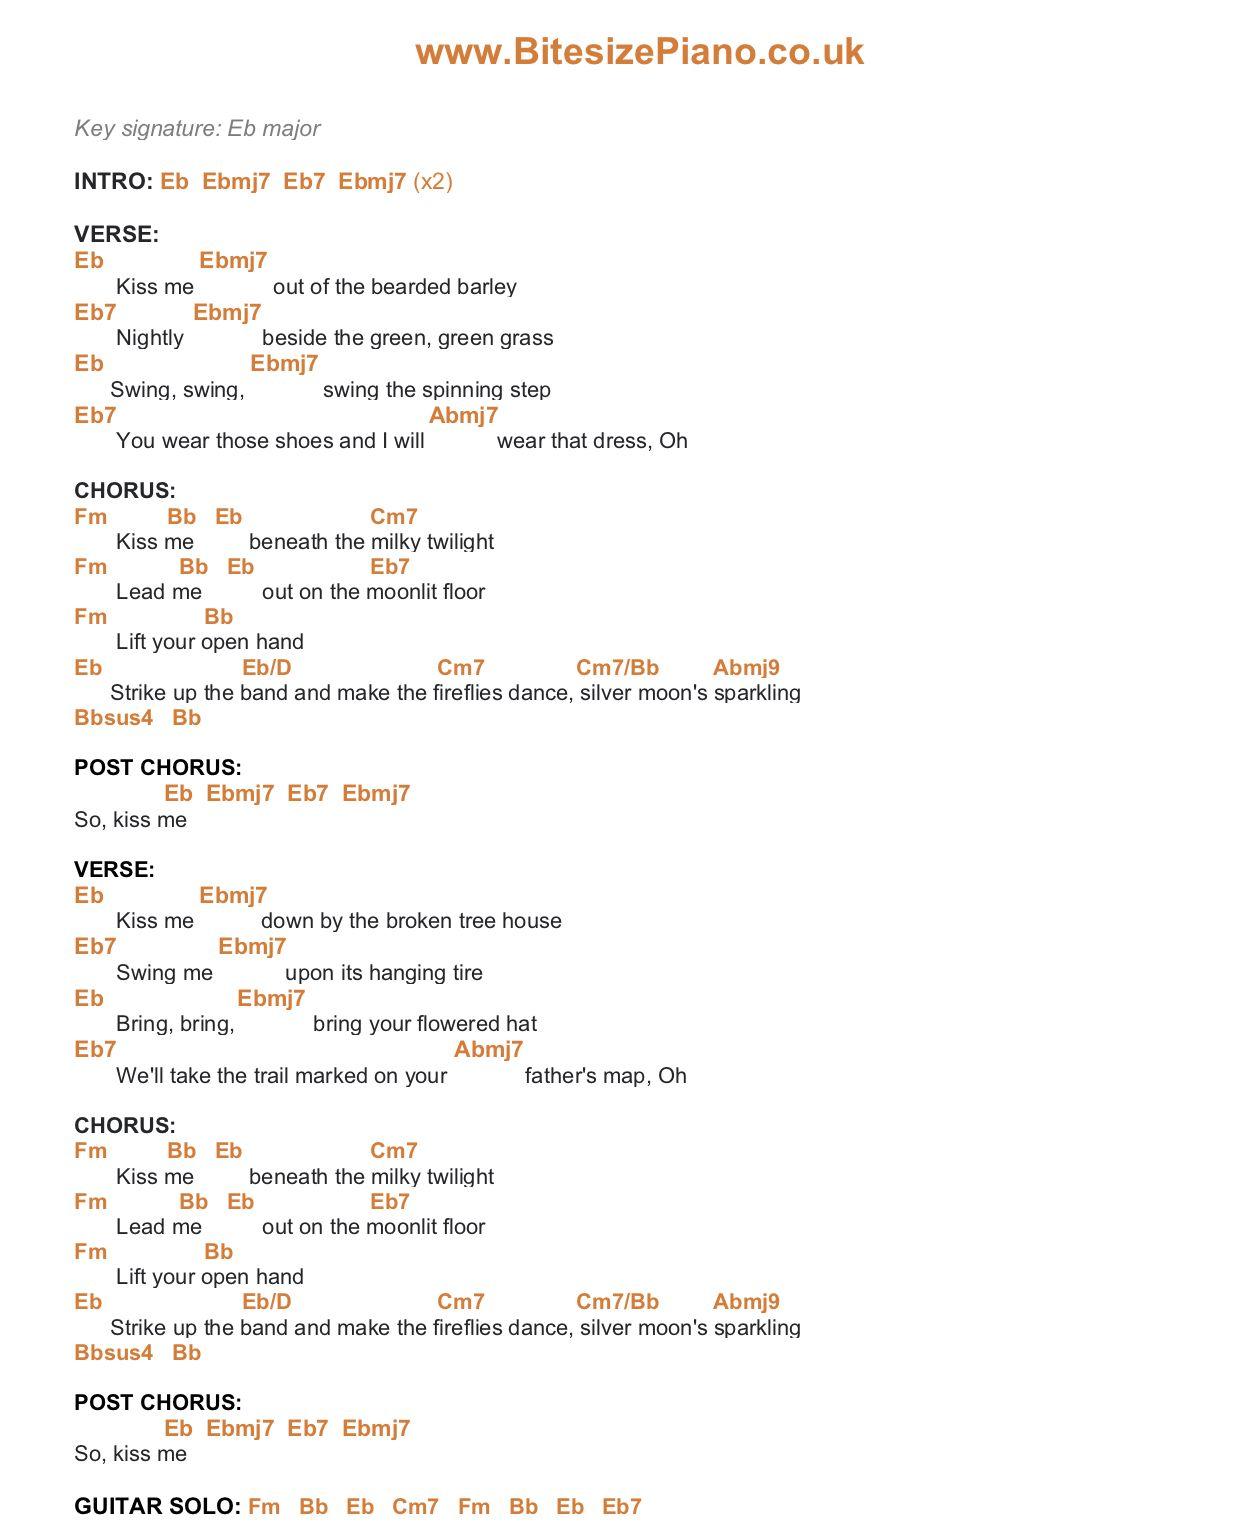 Pin on Bitesize Piano Chords & Lyrics